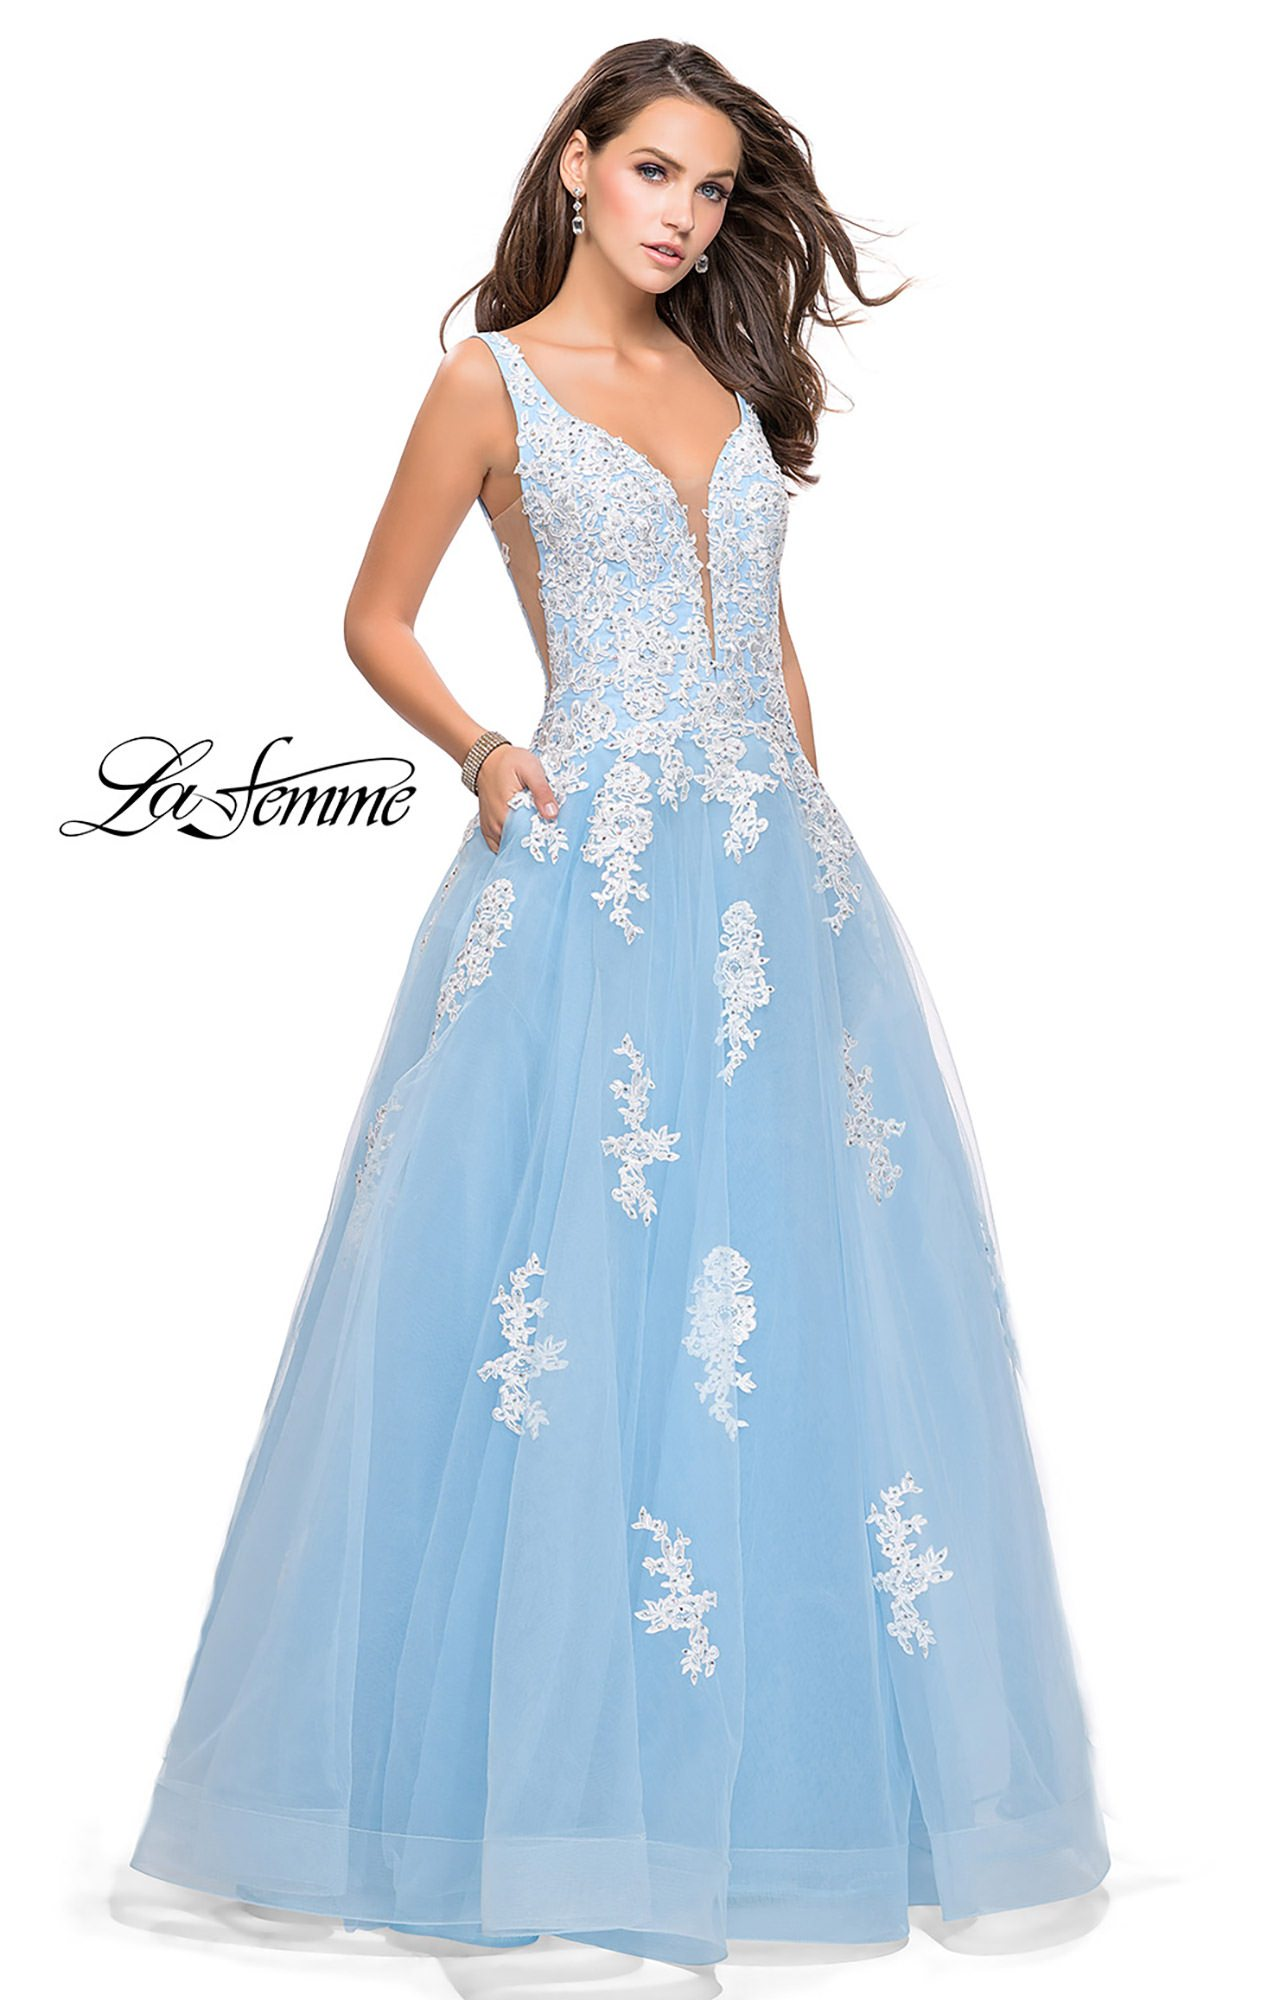 Genealoy Dresses La Femme